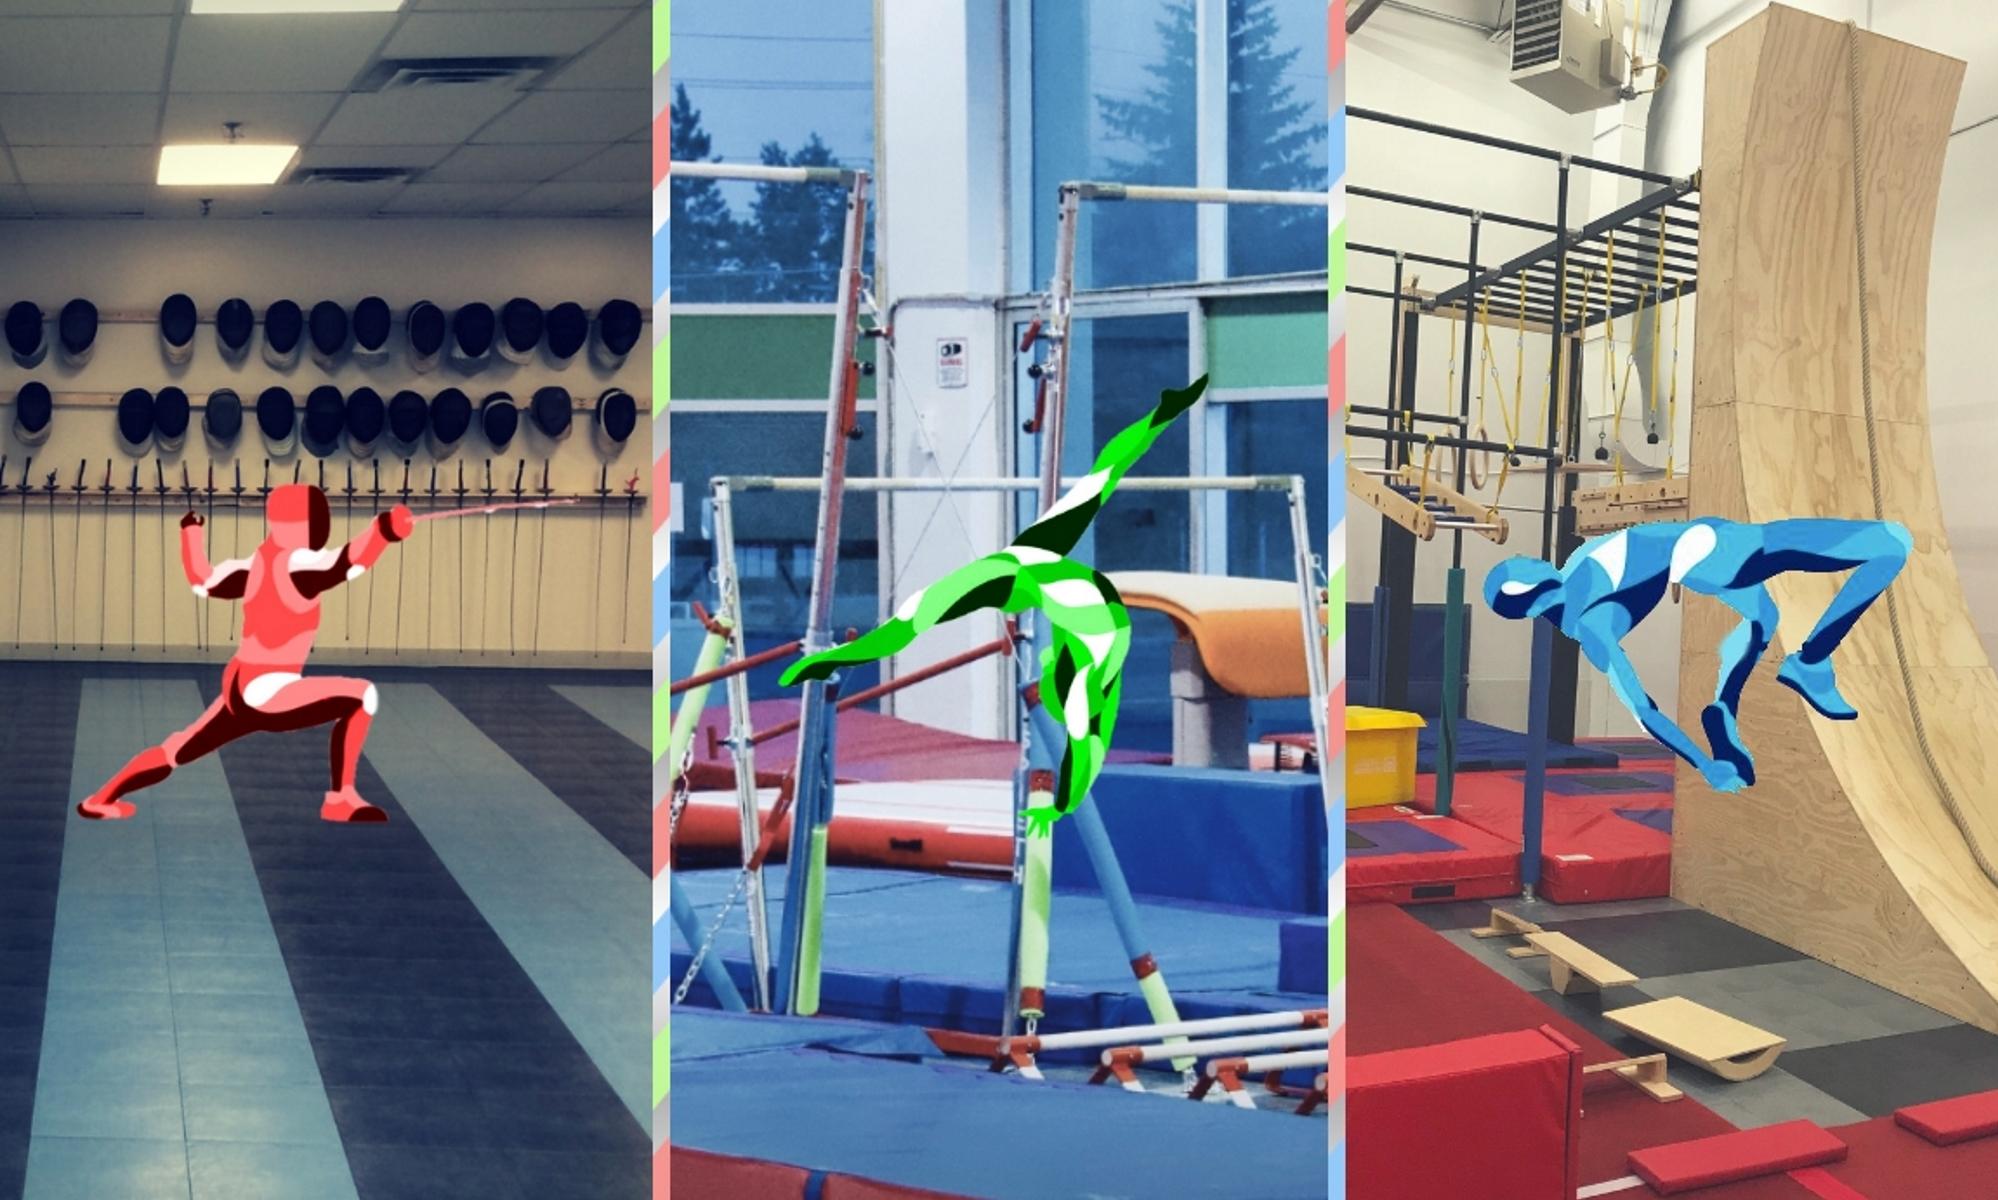 TRYumph Gymnastics